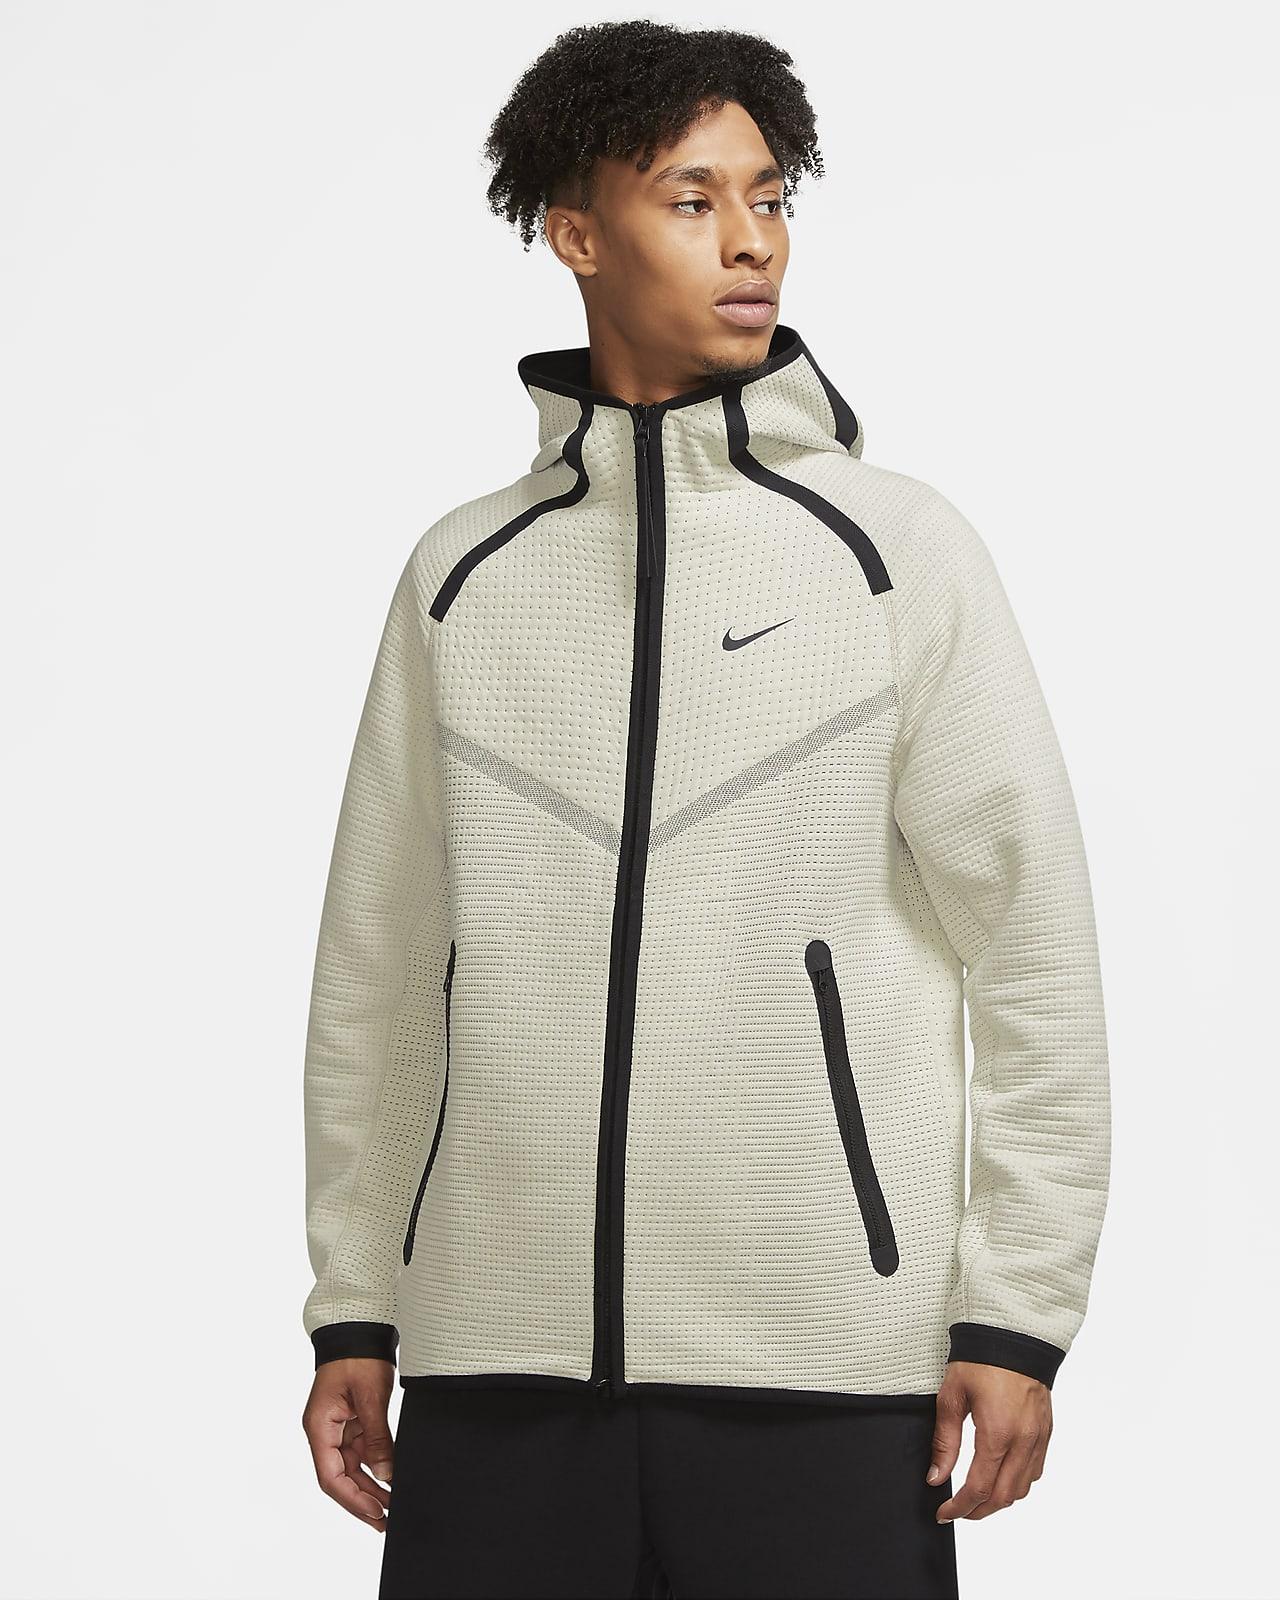 lecho negar champú  Nike Sportswear Tech Pack Windrunner Men's Full-Zip Hoodie. Nike.com